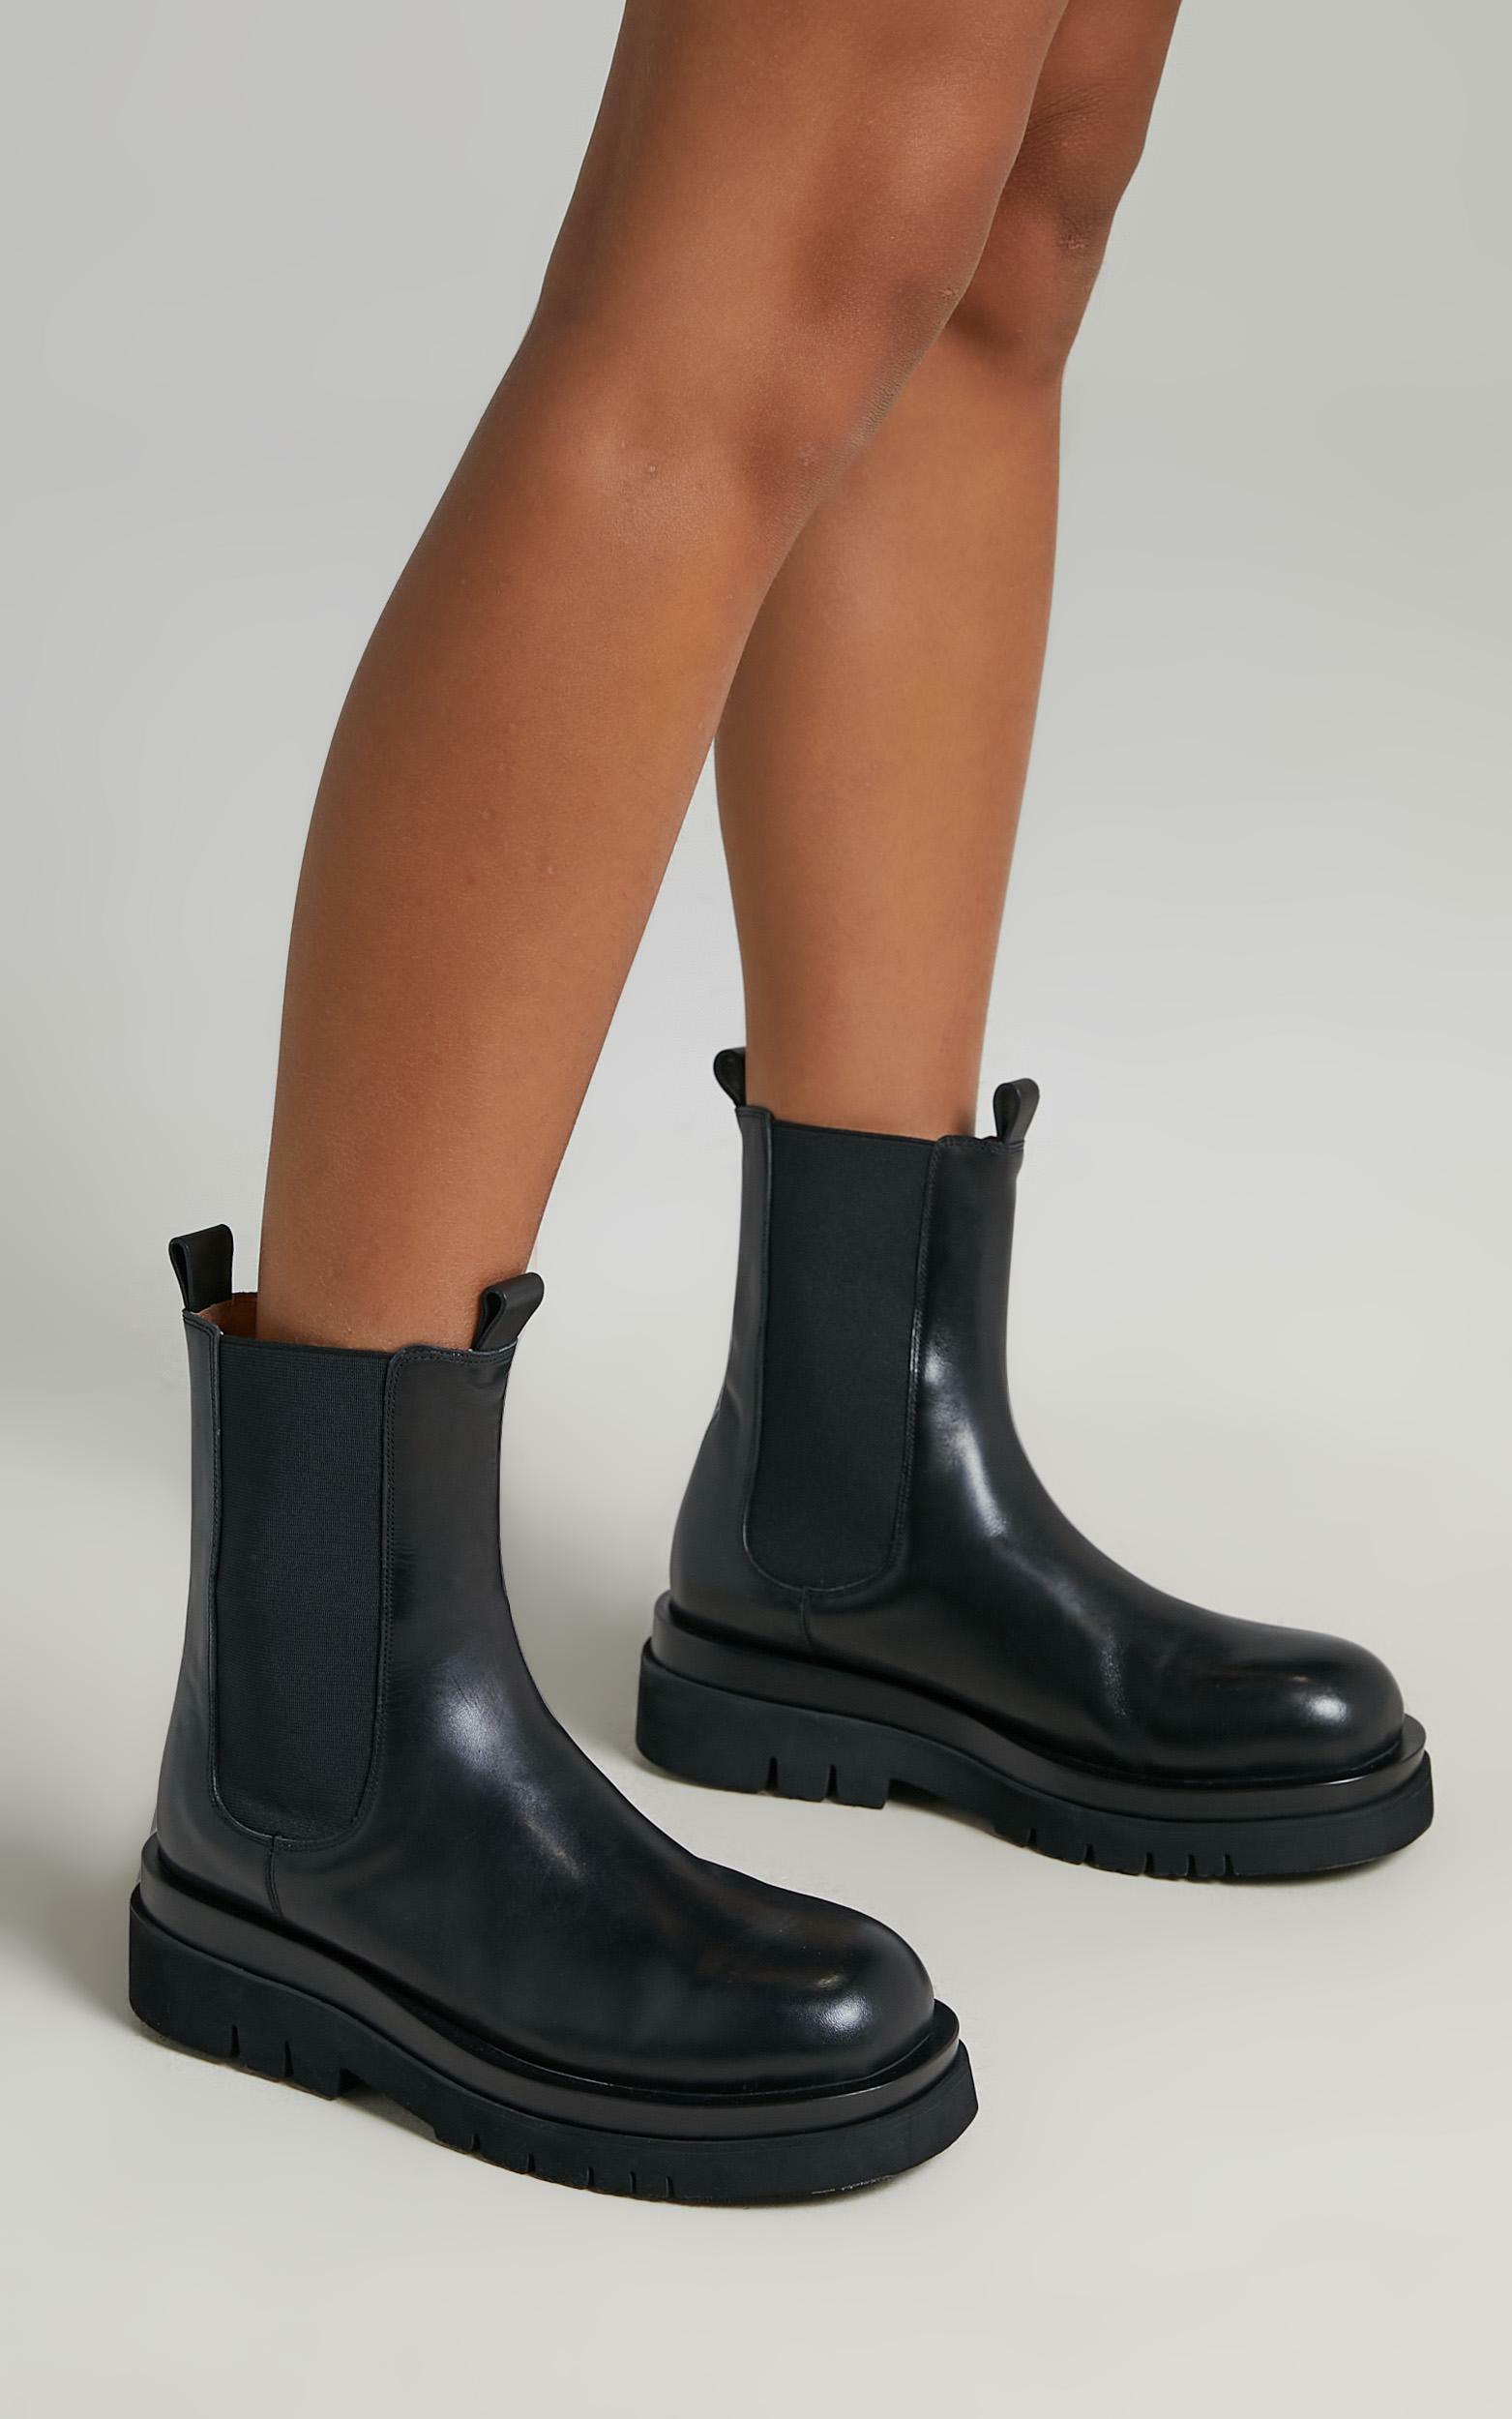 Alias Mae - Cam Boots in Black Burnished - 5.5, BLK1, hi-res image number null